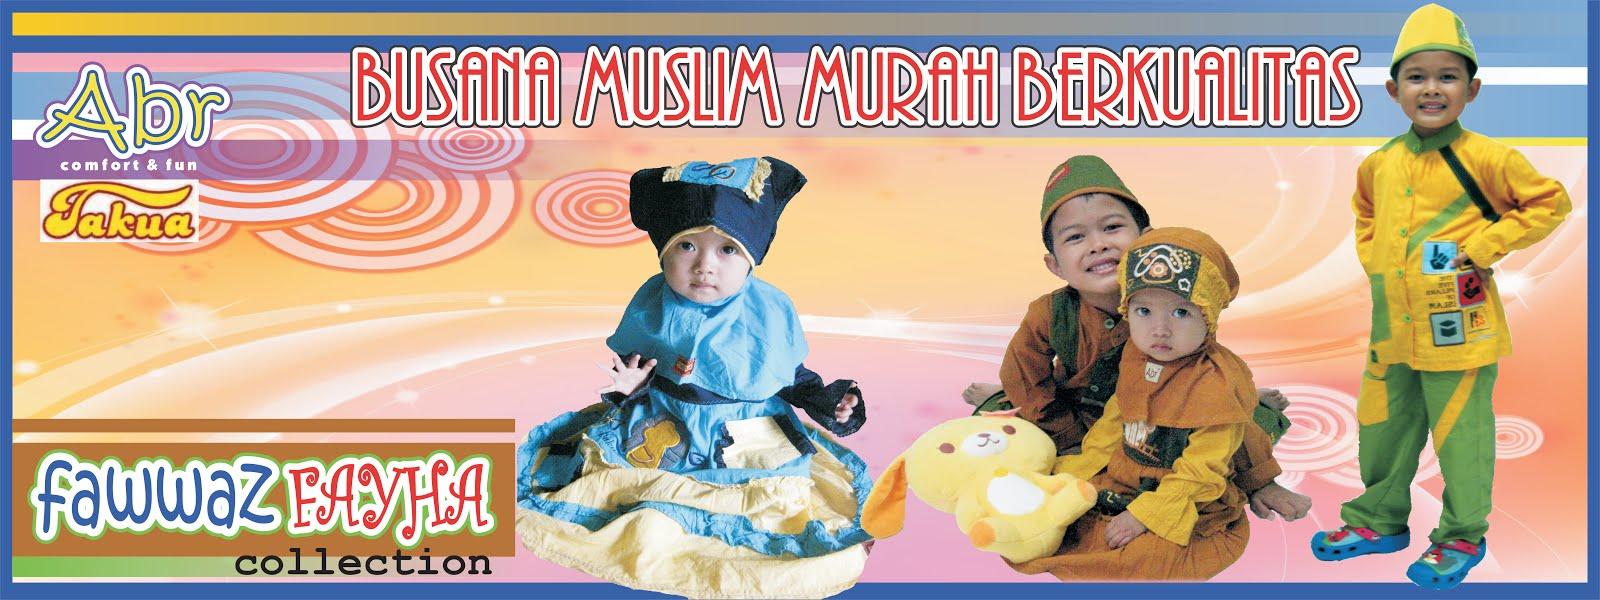 abr muslim anak ceria bergaya